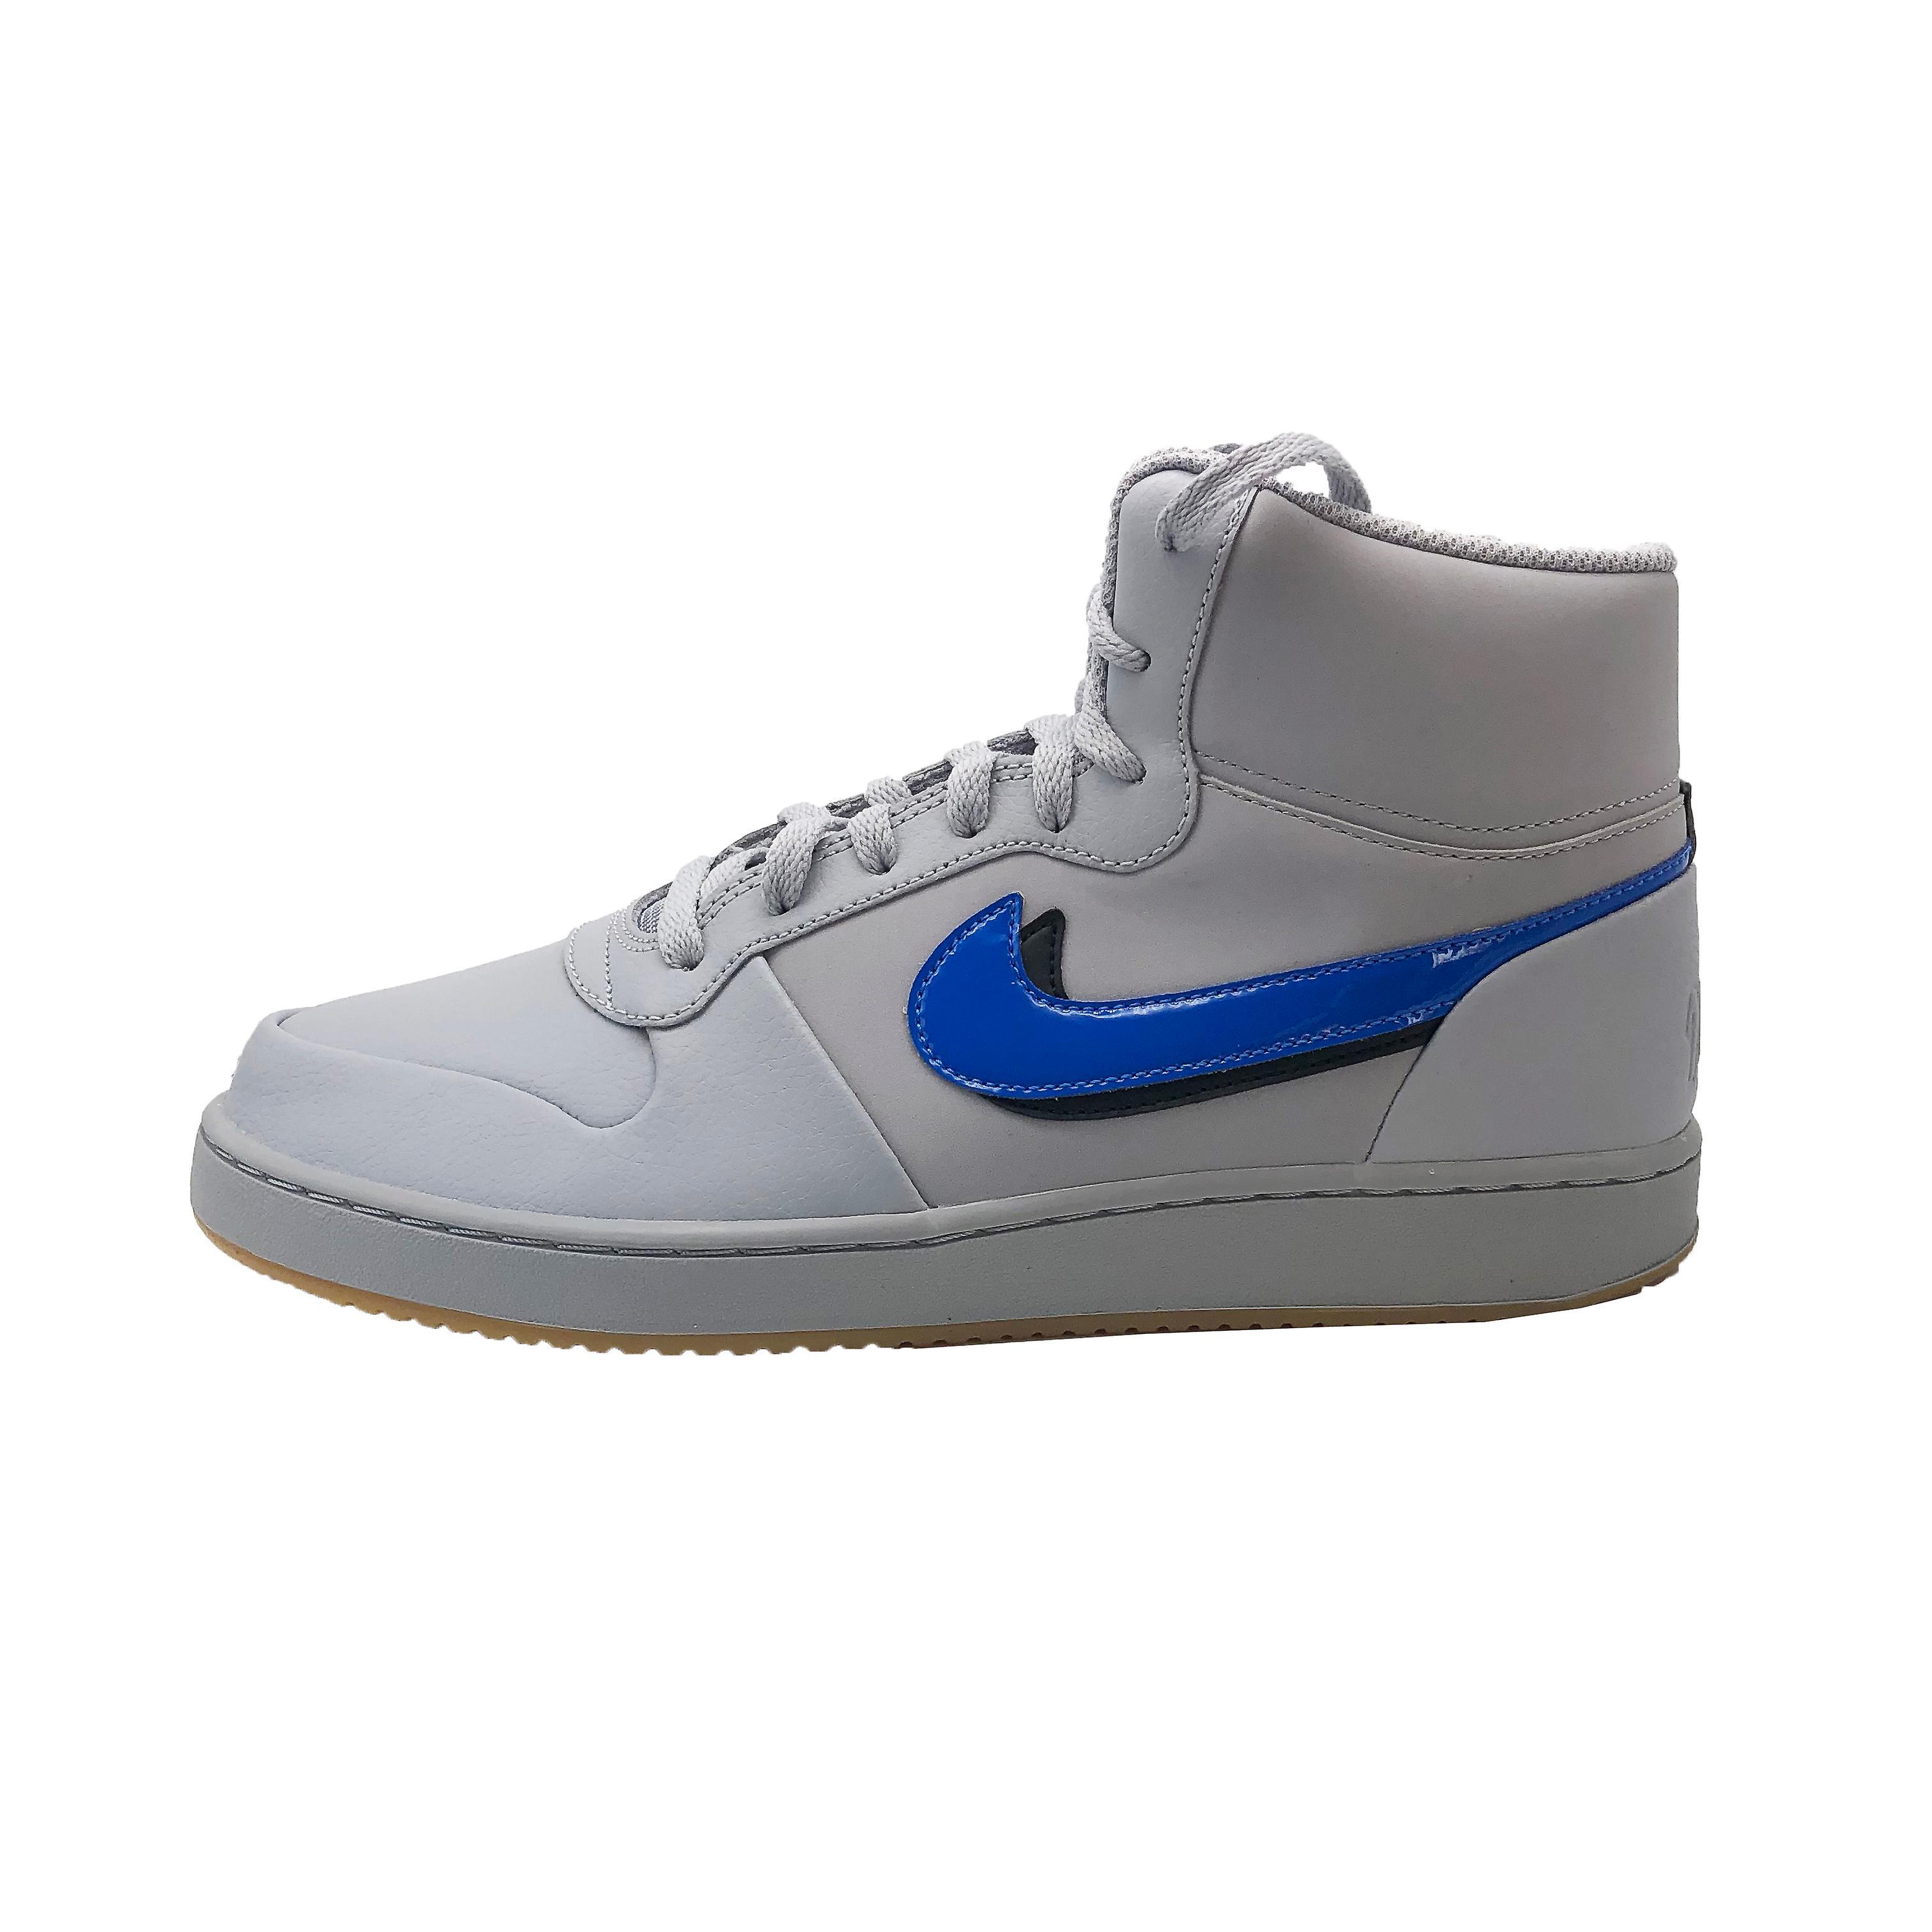 Nike Ebernon Mid PREM AQ1771 001 herr utbildare